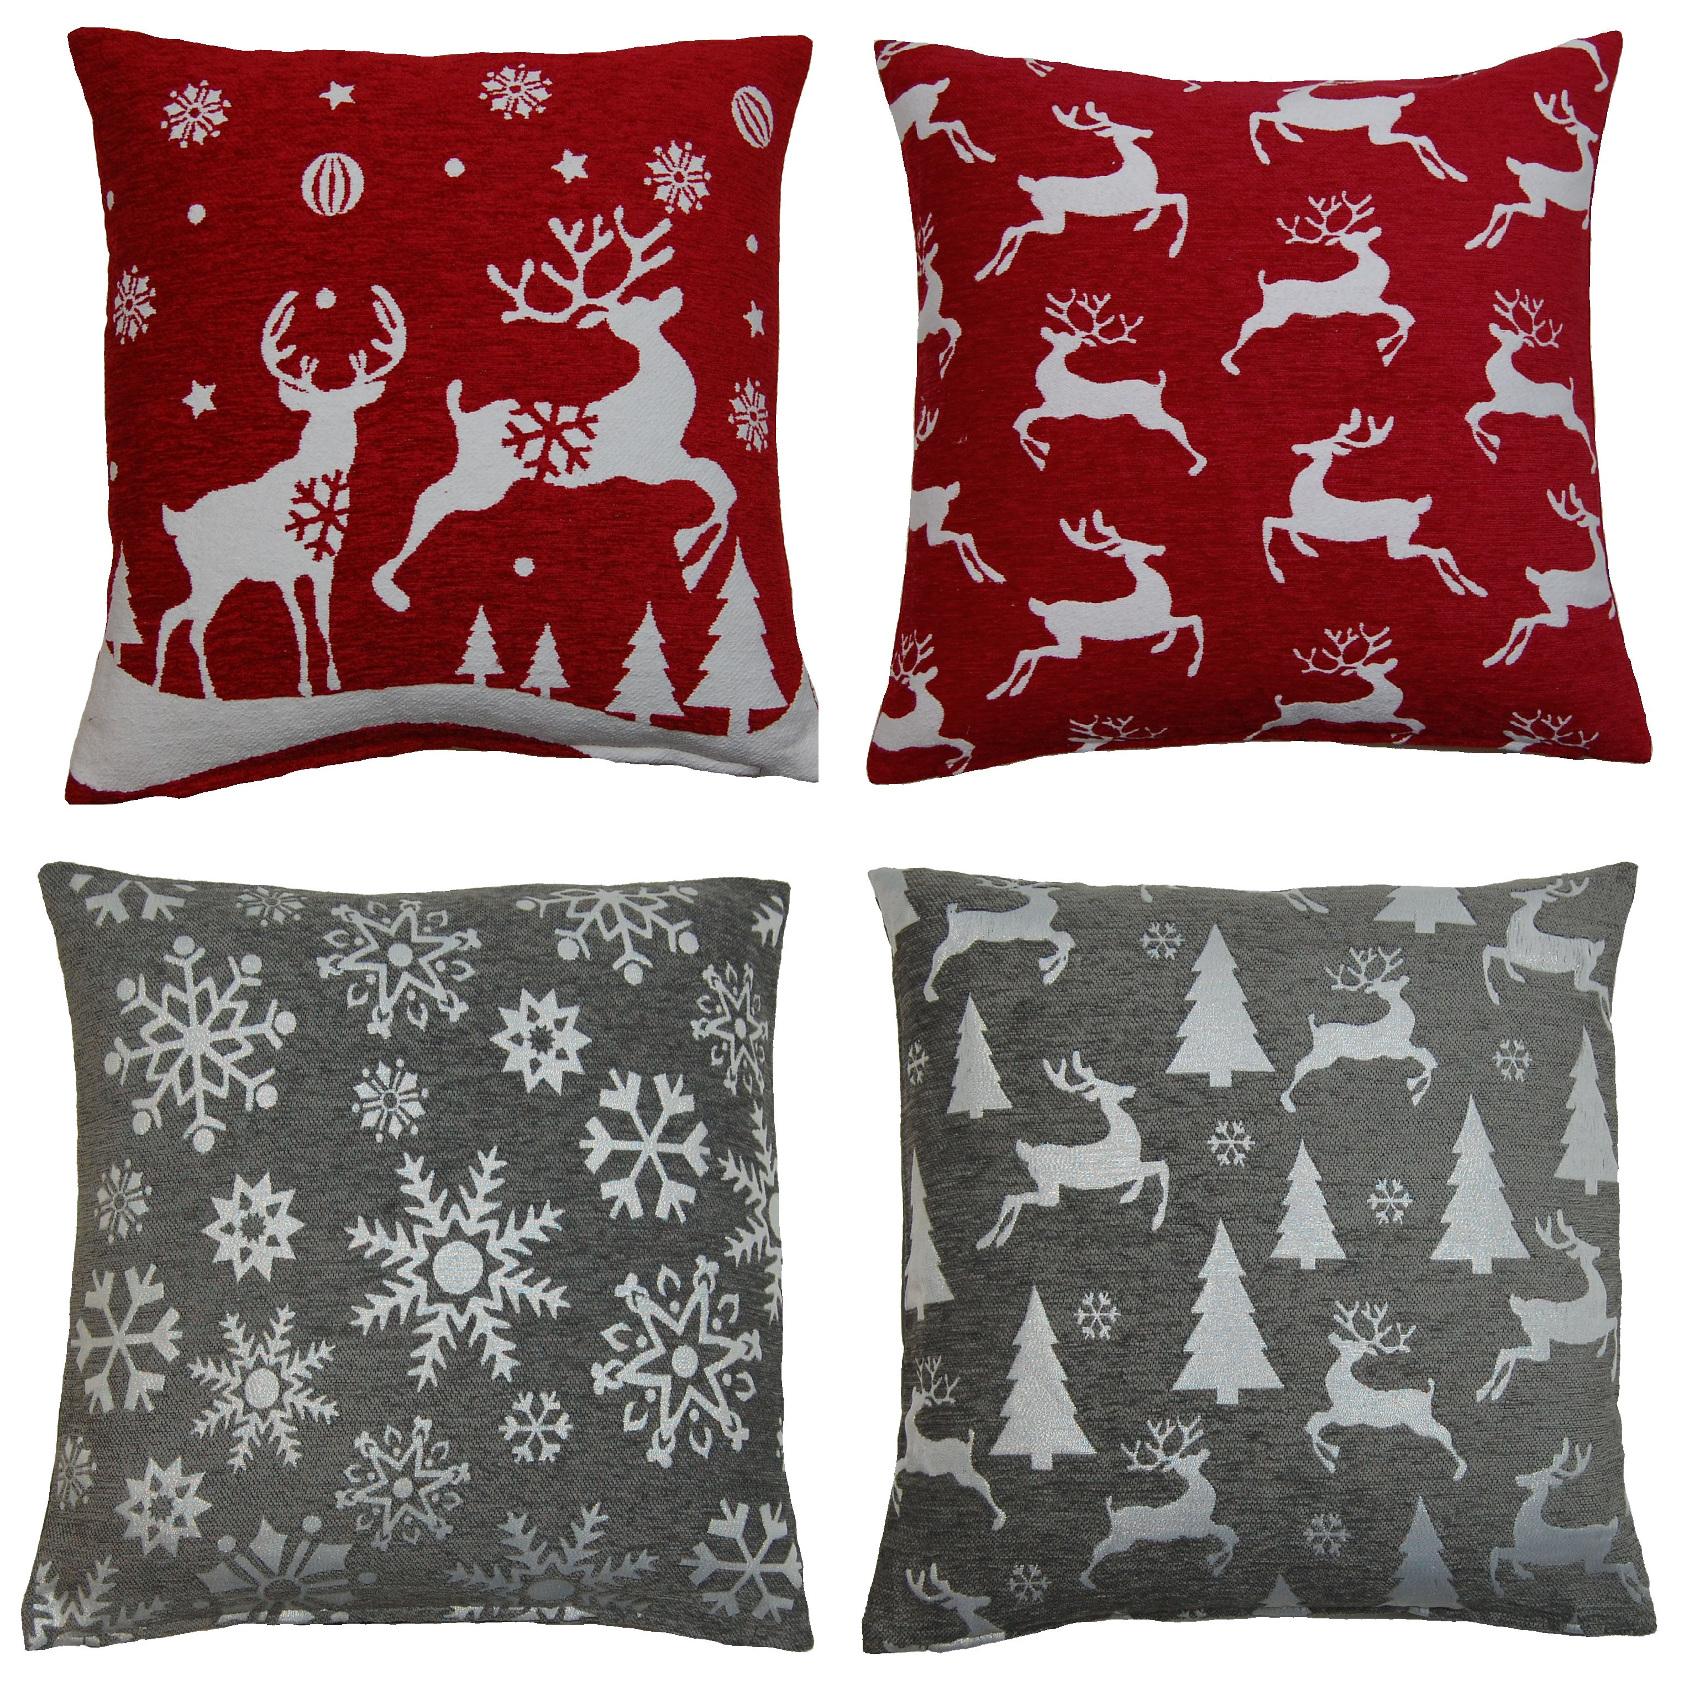 Festive Chenille Christmas Cushion Covers Decorative Xmas